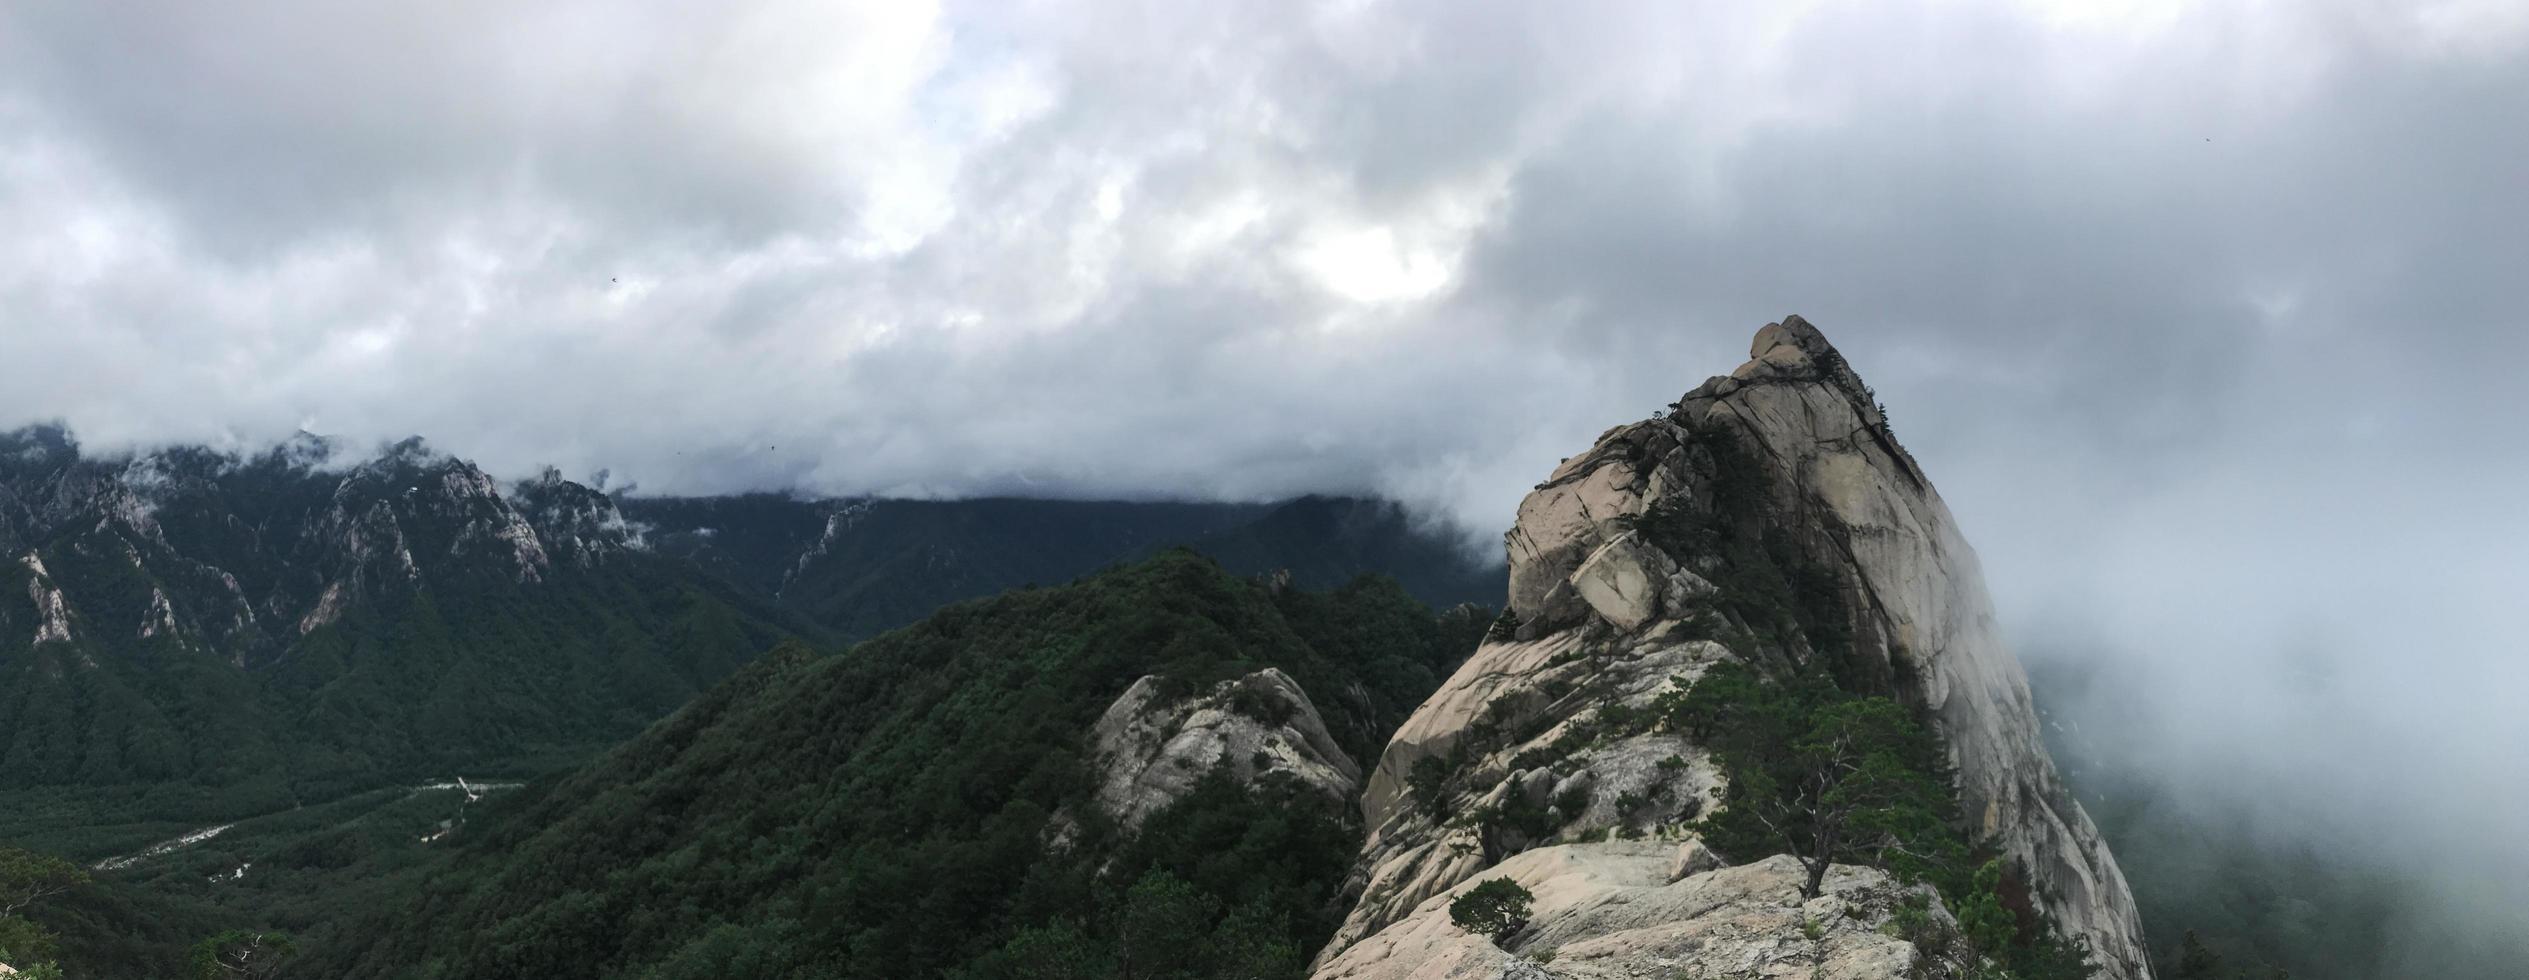 panorama. stora stenar vid Seoraksan nationalpark, Sydkorea foto